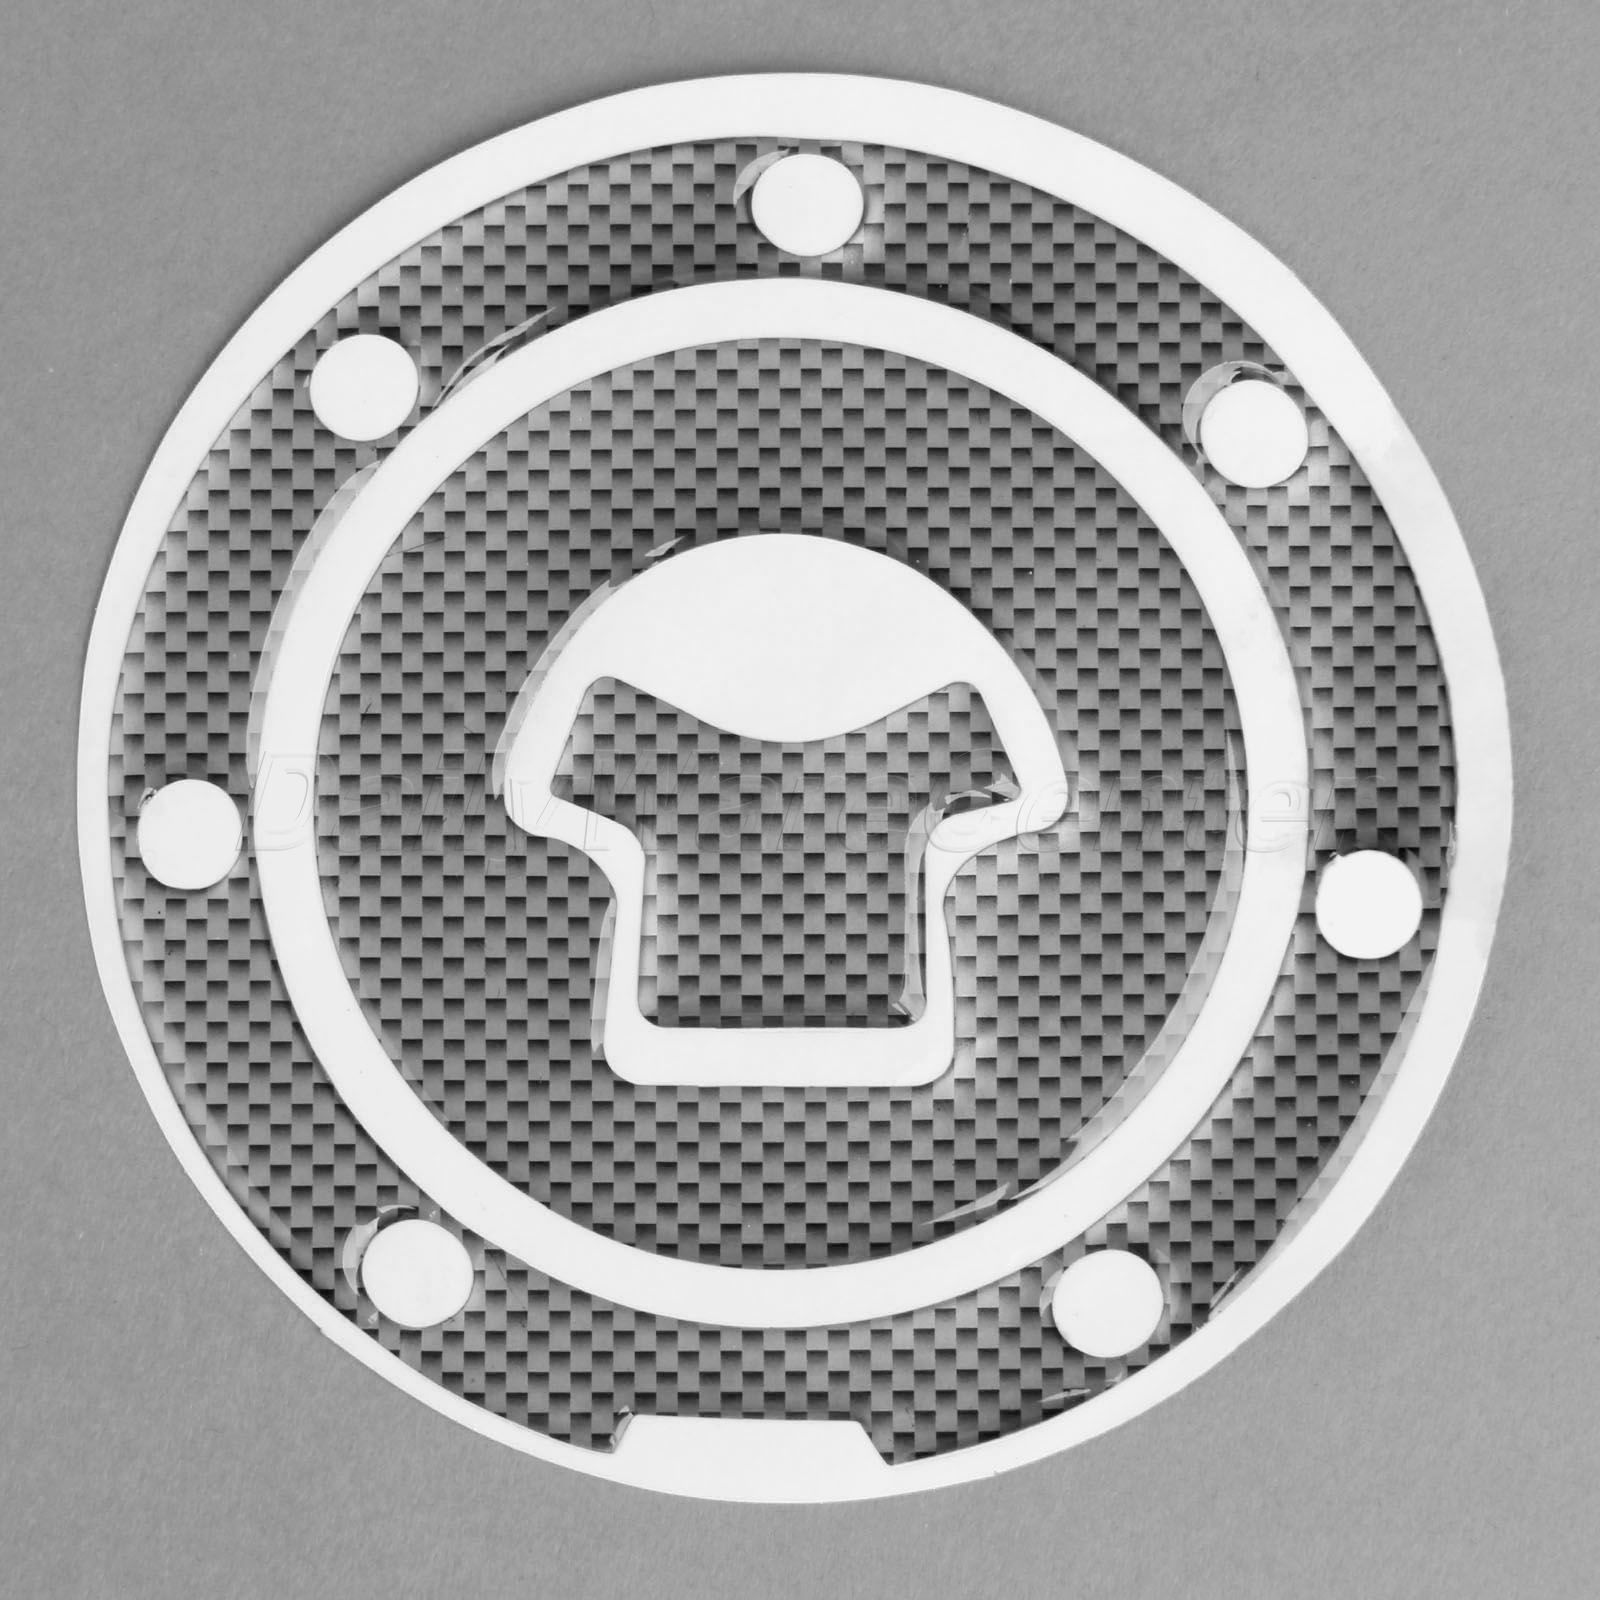 New 1x Mototcycle Oil Gas Cap Decals Fuel Cap Cover Pad Protector Stickers For Honda Cbr600rr Cbr1000rr Car Styling Carbo Honda Cbr600rr Carbon Fiber Gas Tanks [ 1600 x 1600 Pixel ]